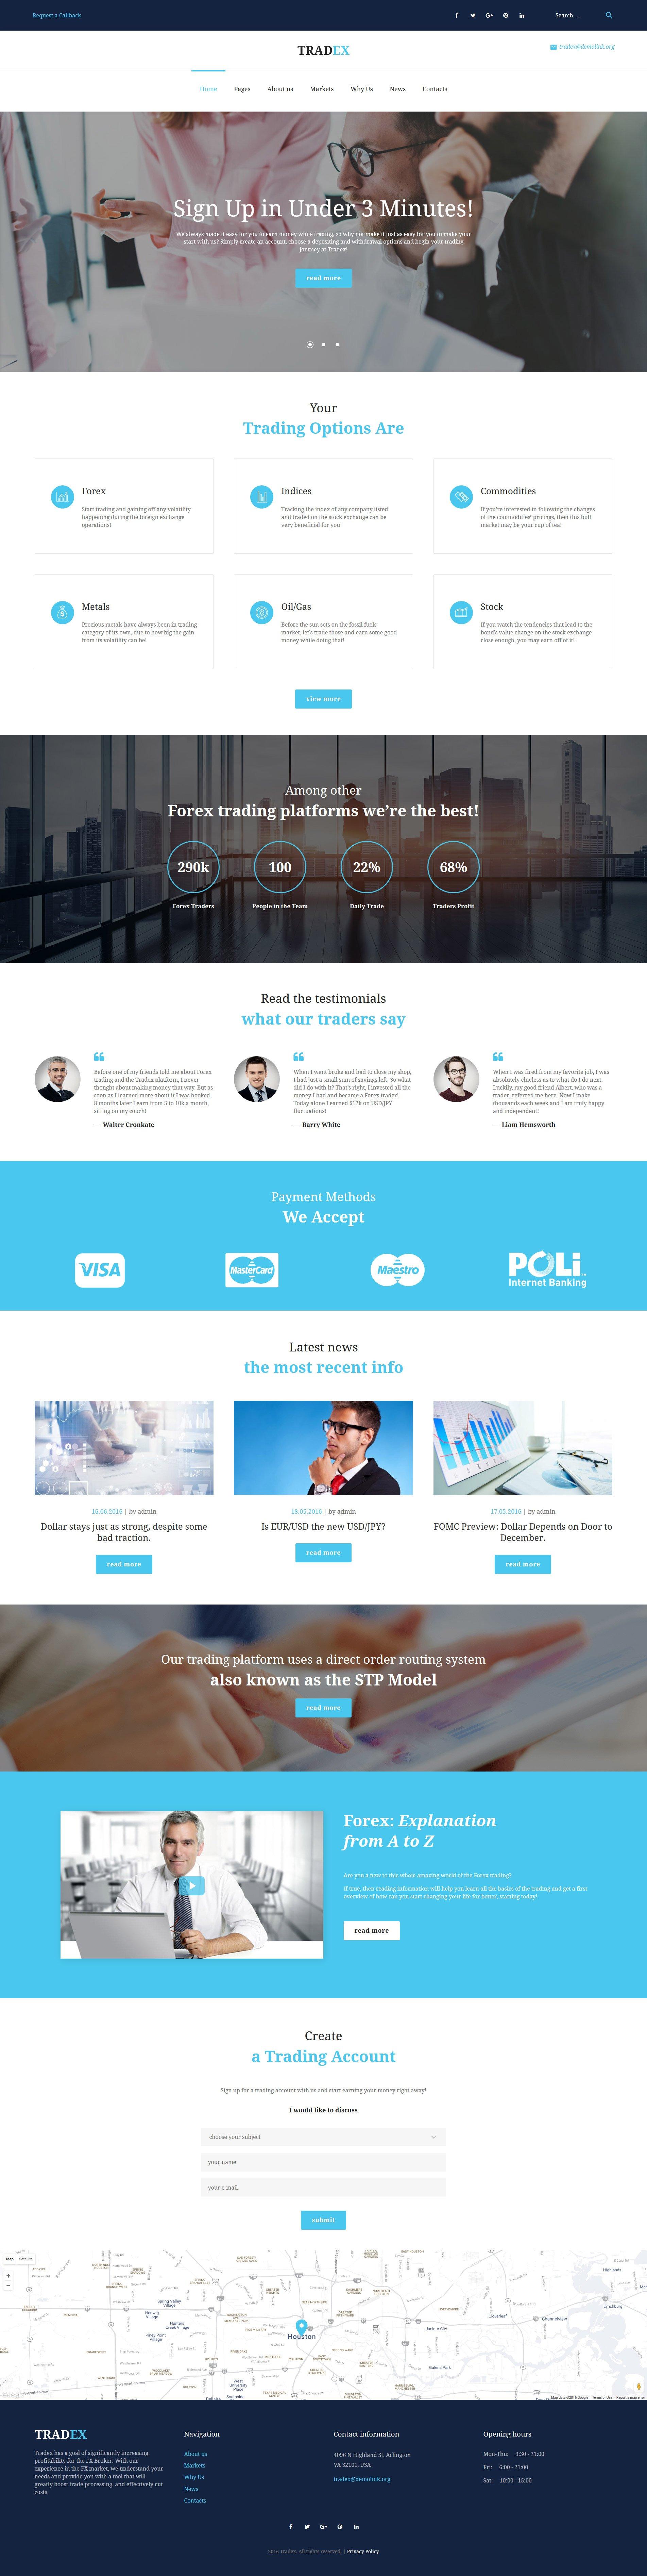 Responsivt Tradex - Forex Trading WordPress-tema #61298